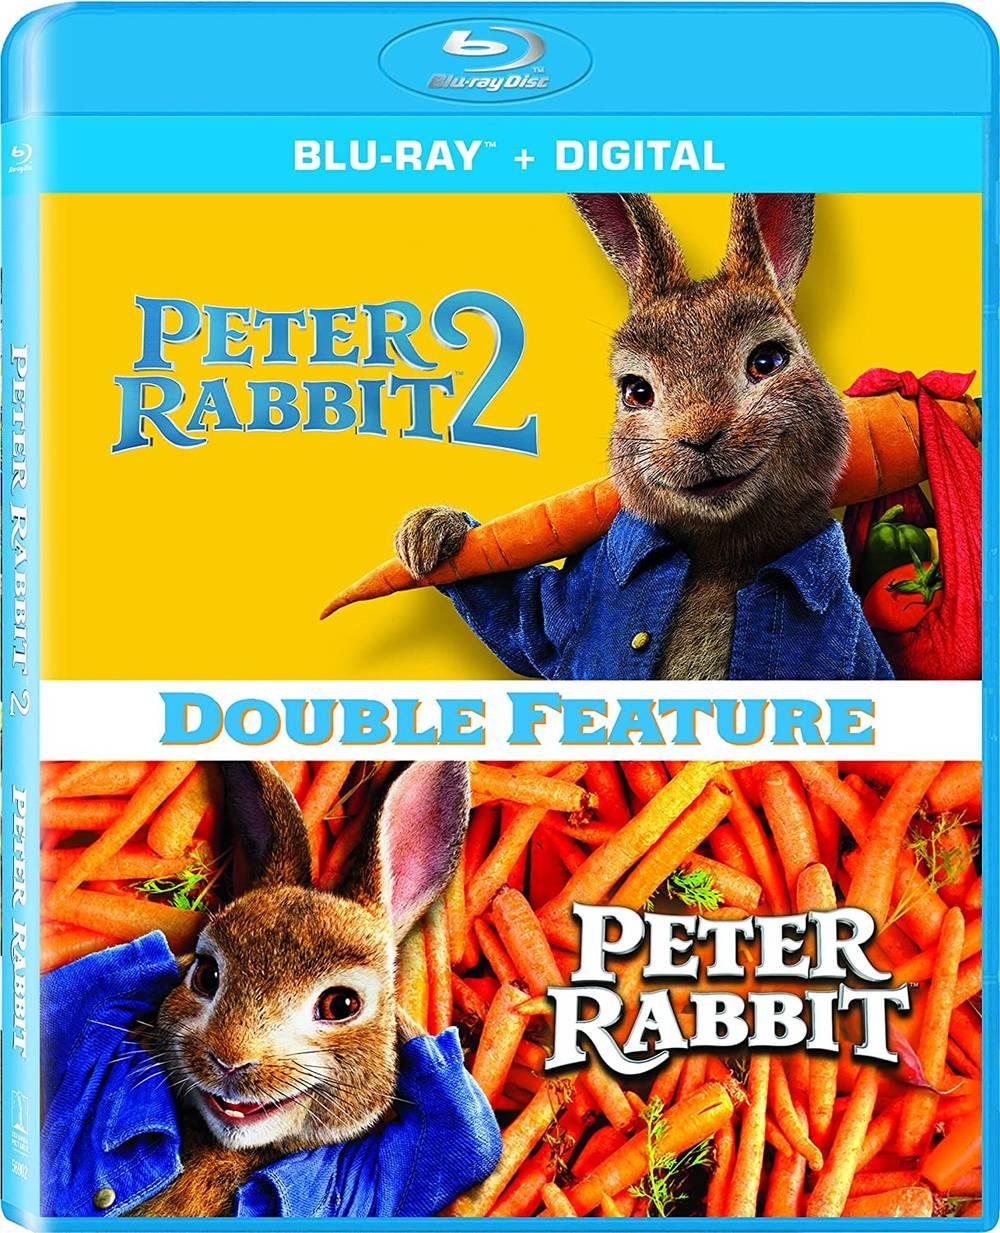 Peter Rabbit [Movie] - Peter Rabbit / Peter Rabbit 2: The Runaway - Set